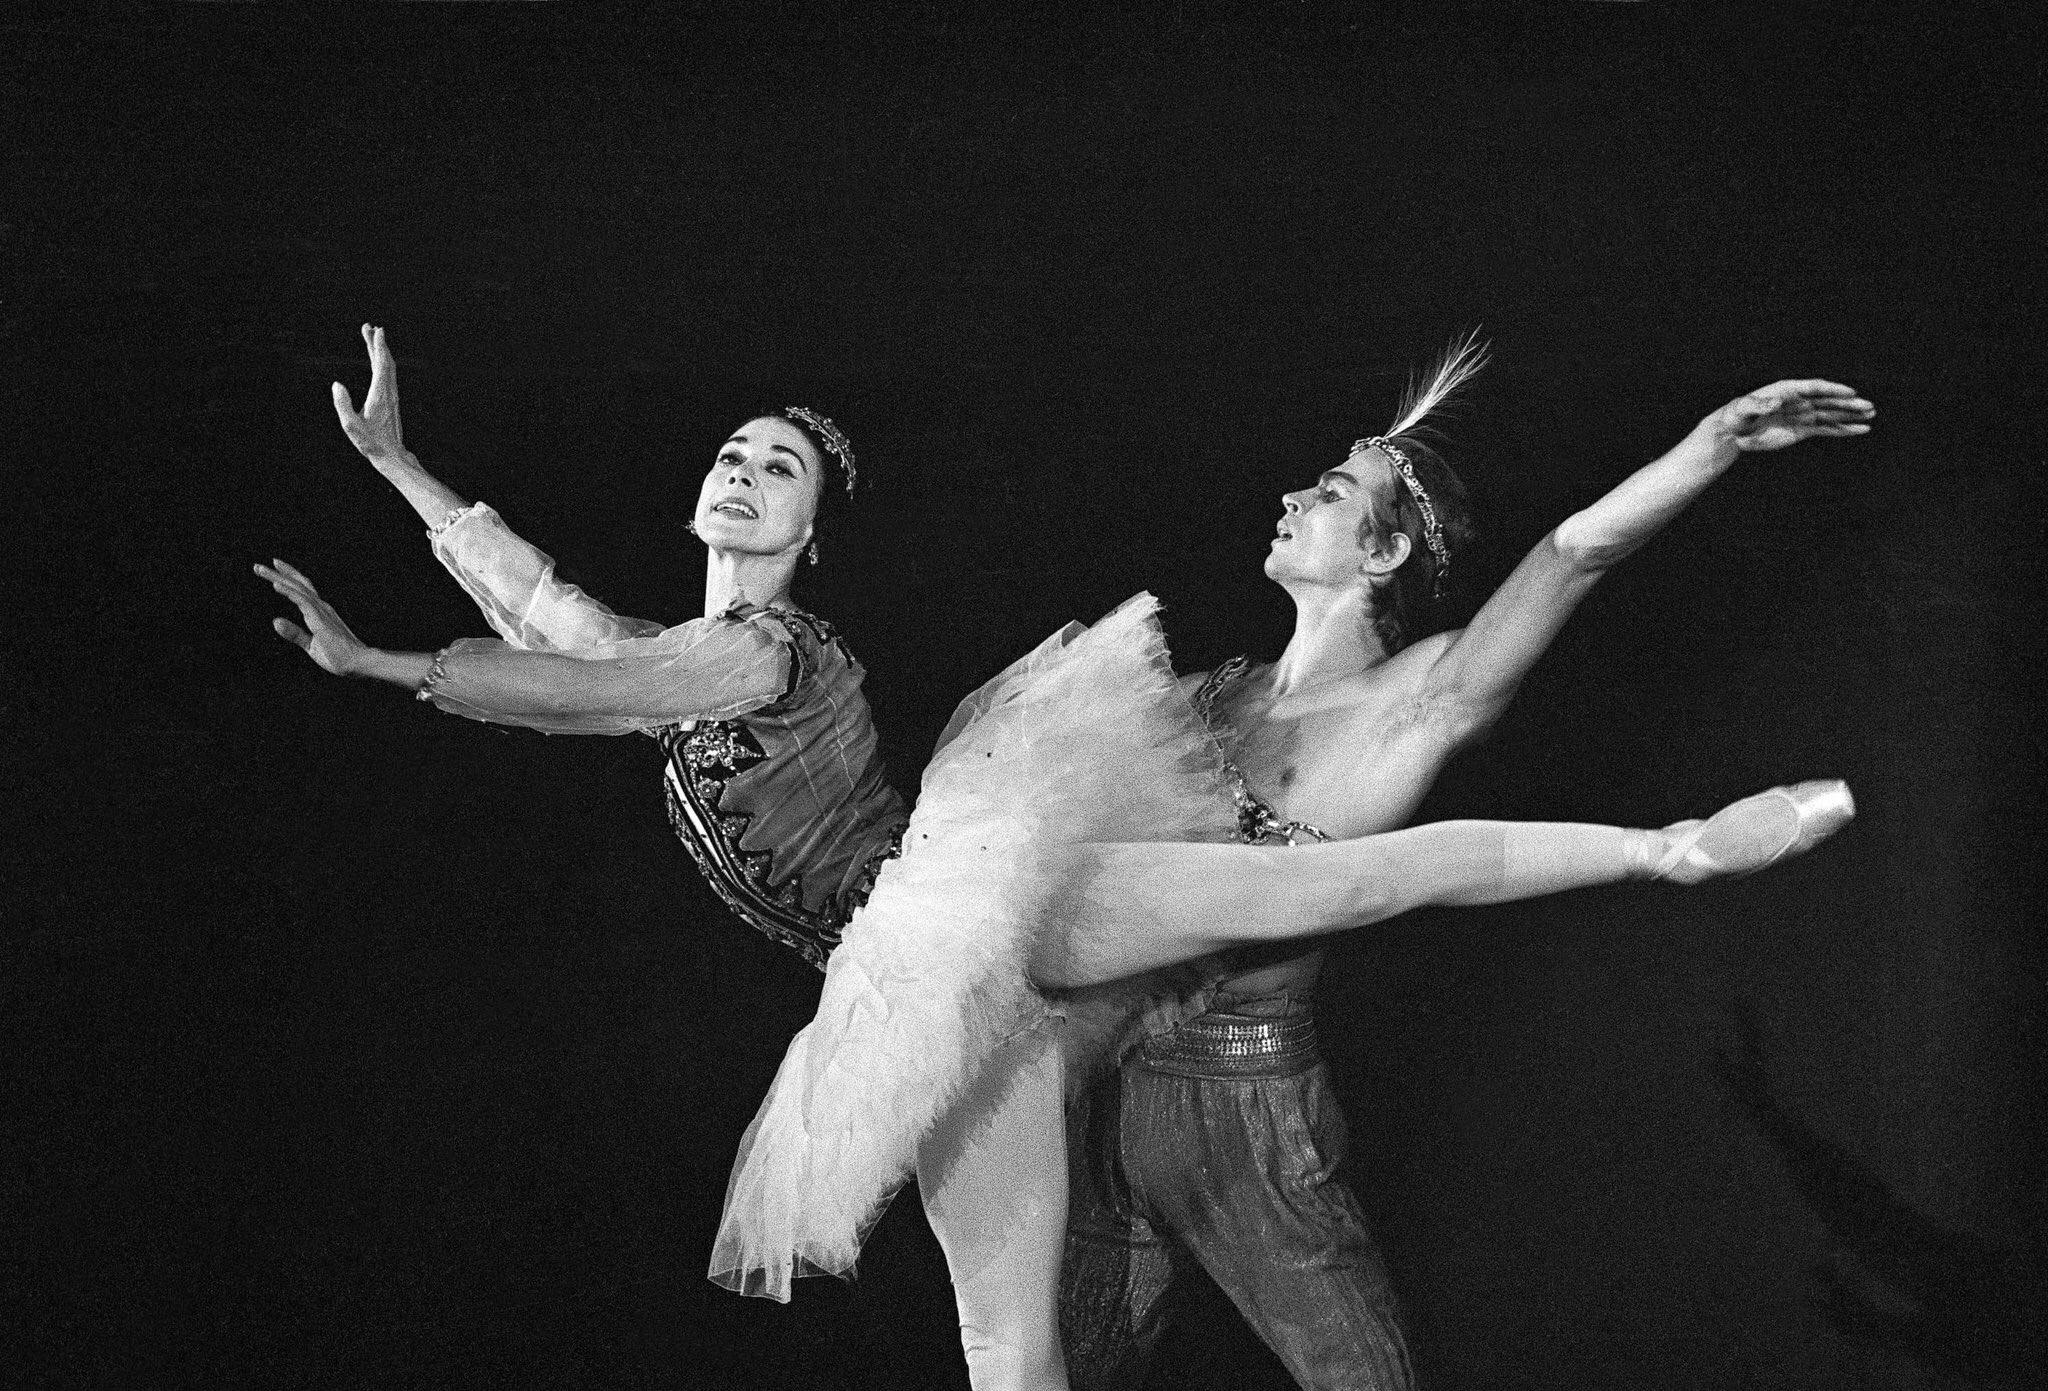 Dancers Rudolf Nureyev and Margot Fonteyn performing Le Corsaire, at the Ein Gedi Kibboutz. 1963.  Fonteyn was born on this day 100 years ago.  © Rene Burri/Magnum Photos https://t.co/luWBhFvgLr